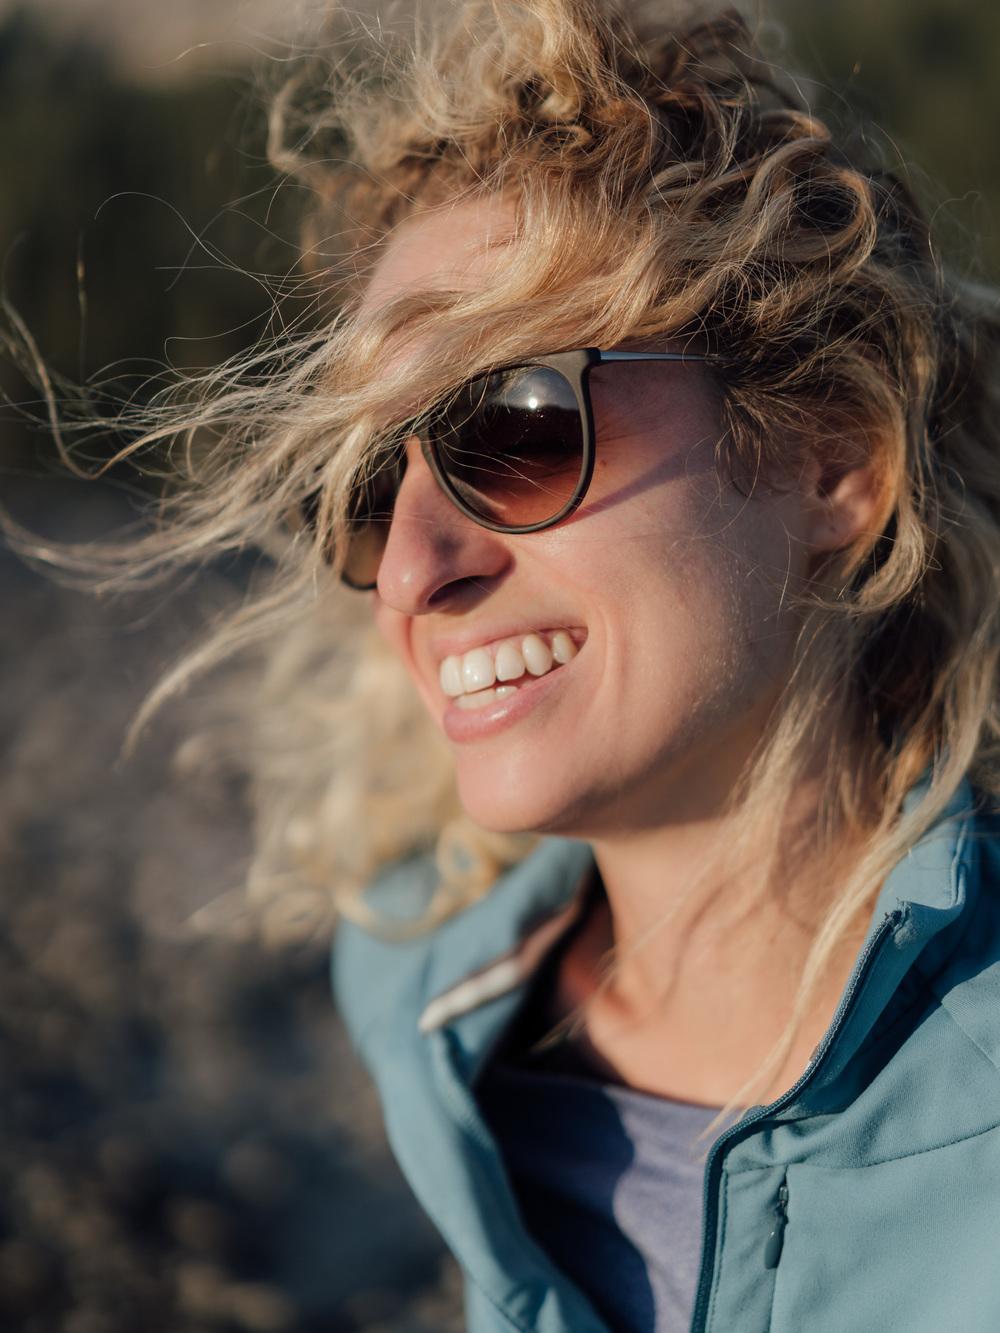 Shannon  |7.3.16| Yosemite National Park, California